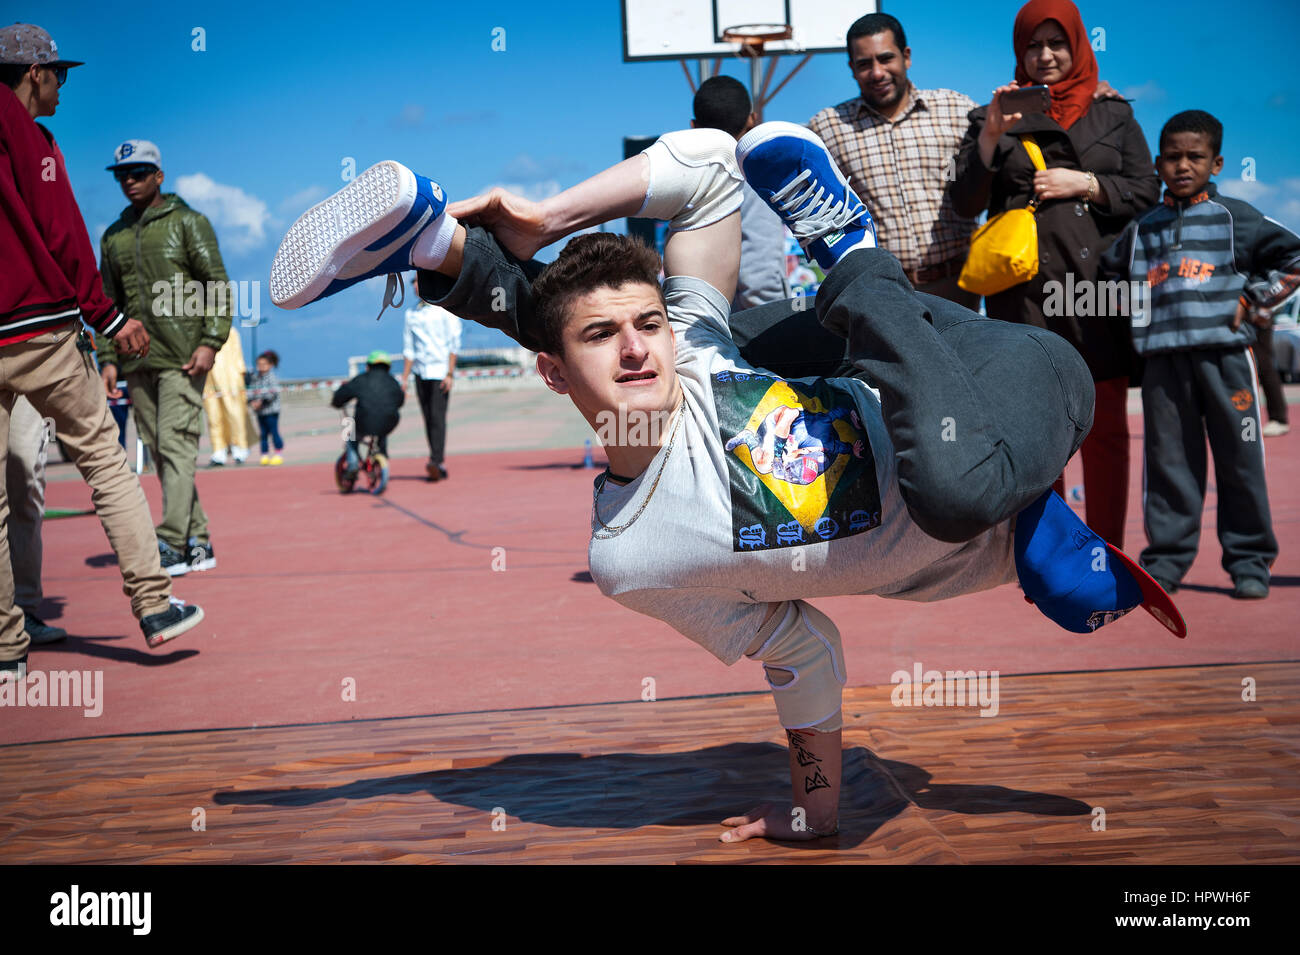 Libyen, Tripolis: Junge Kerle Breakdance bei einem Open-Air-Tanz und Parkour-Festival. Stockbild